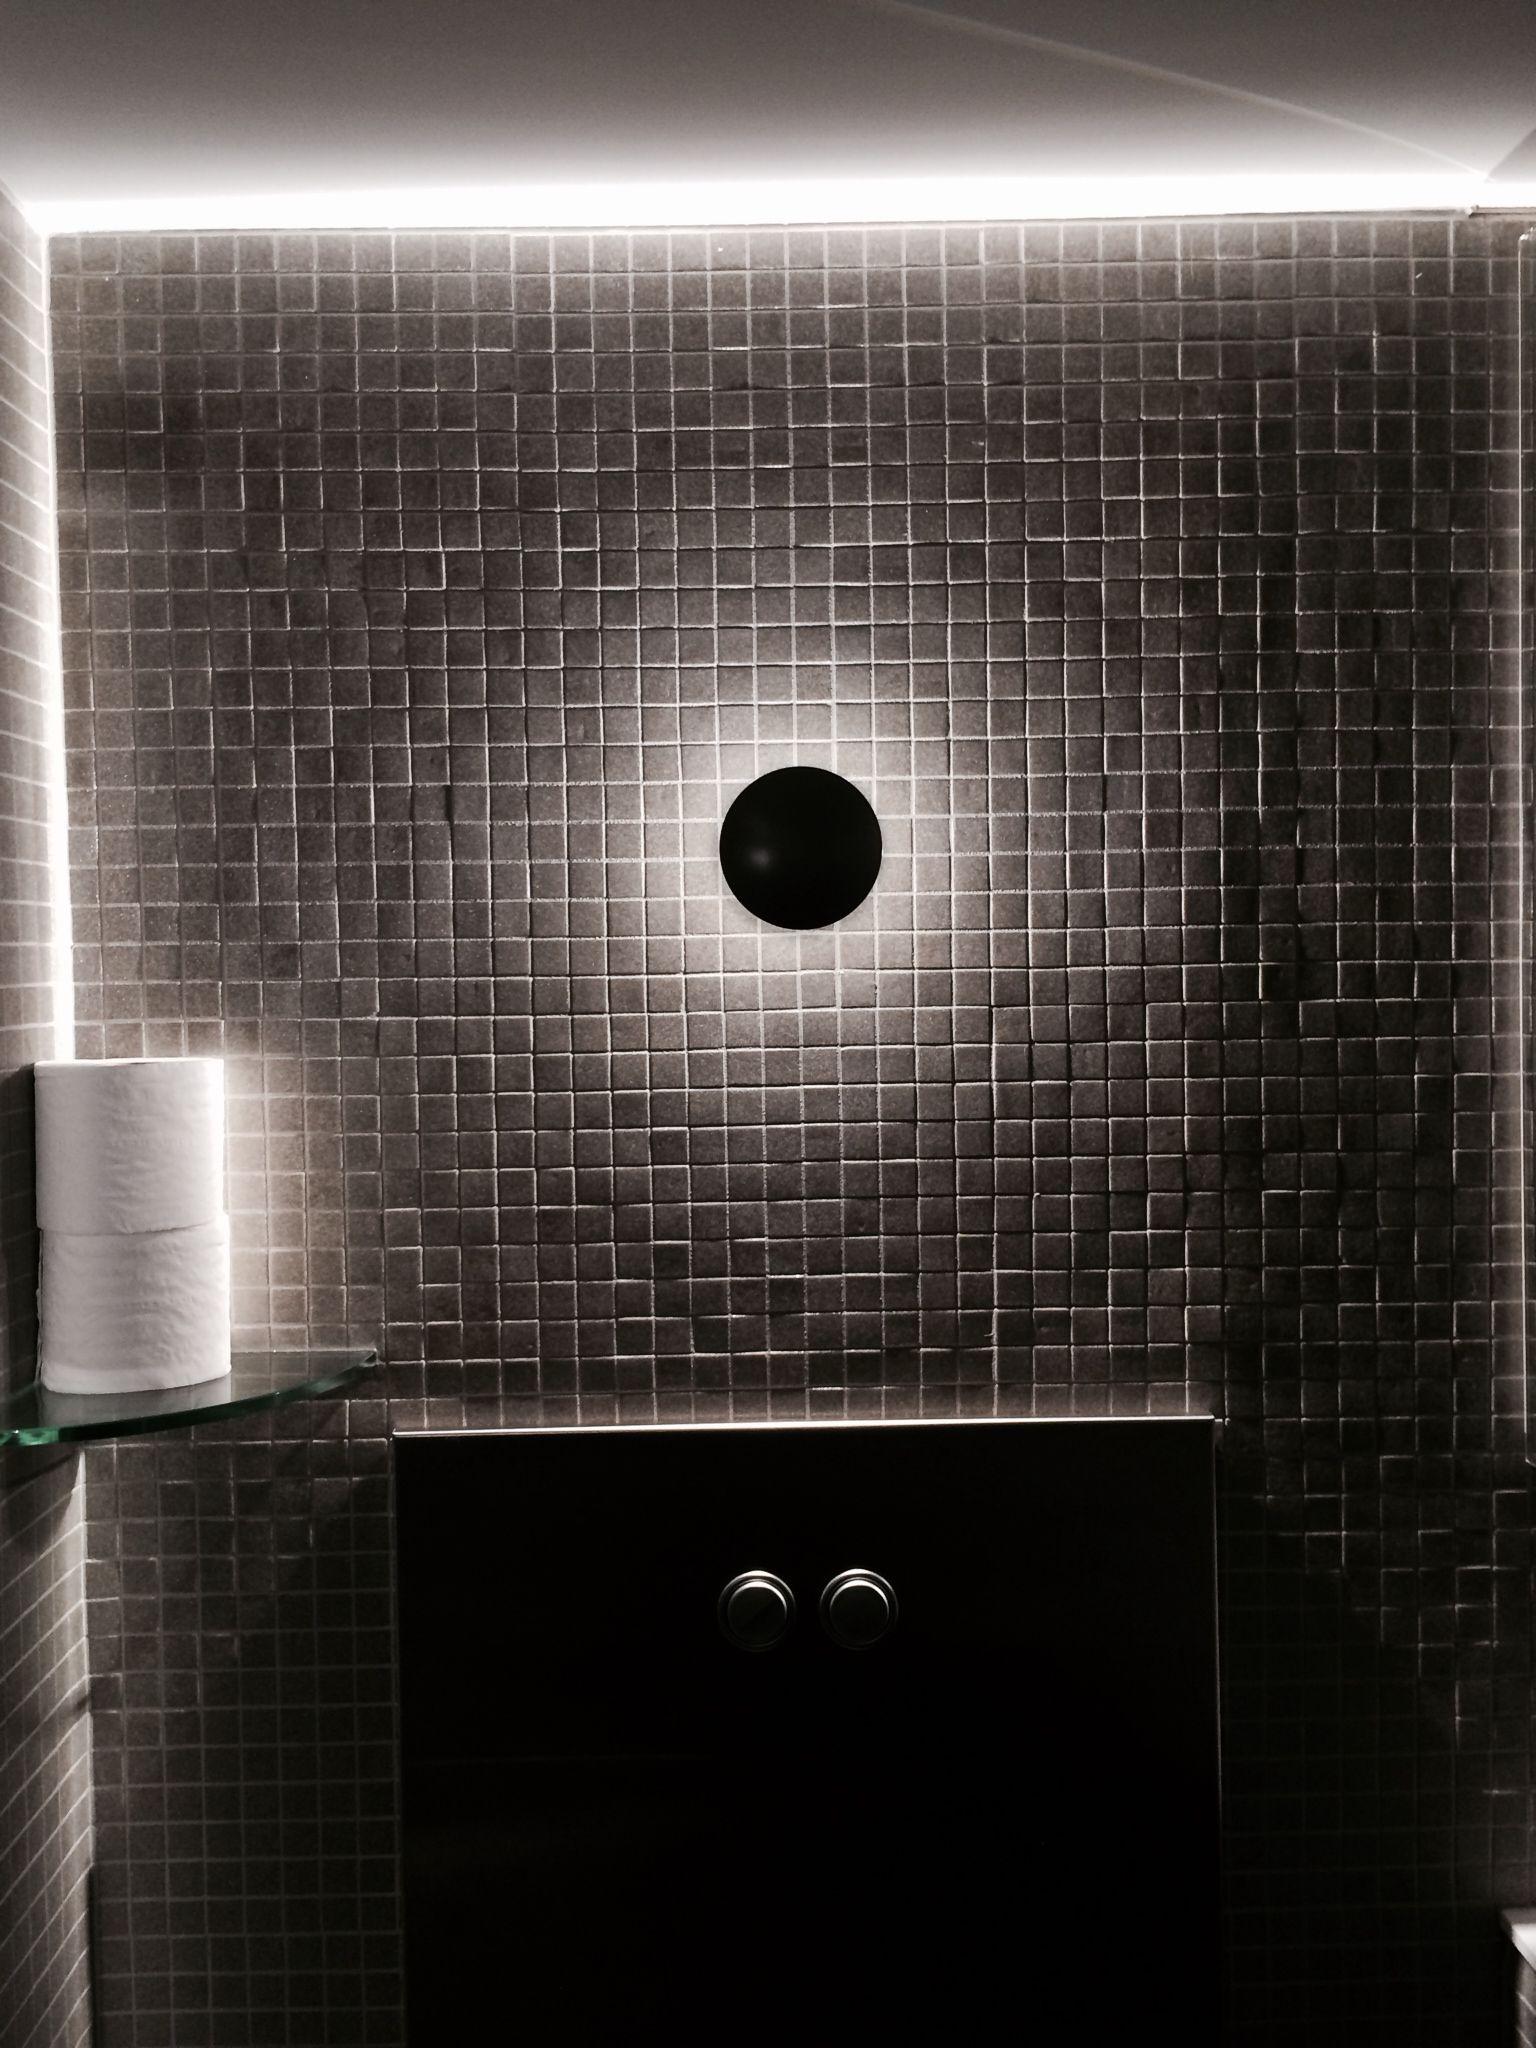 iguzzini trick radial application iguzzini sydney studio. Black Bedroom Furniture Sets. Home Design Ideas